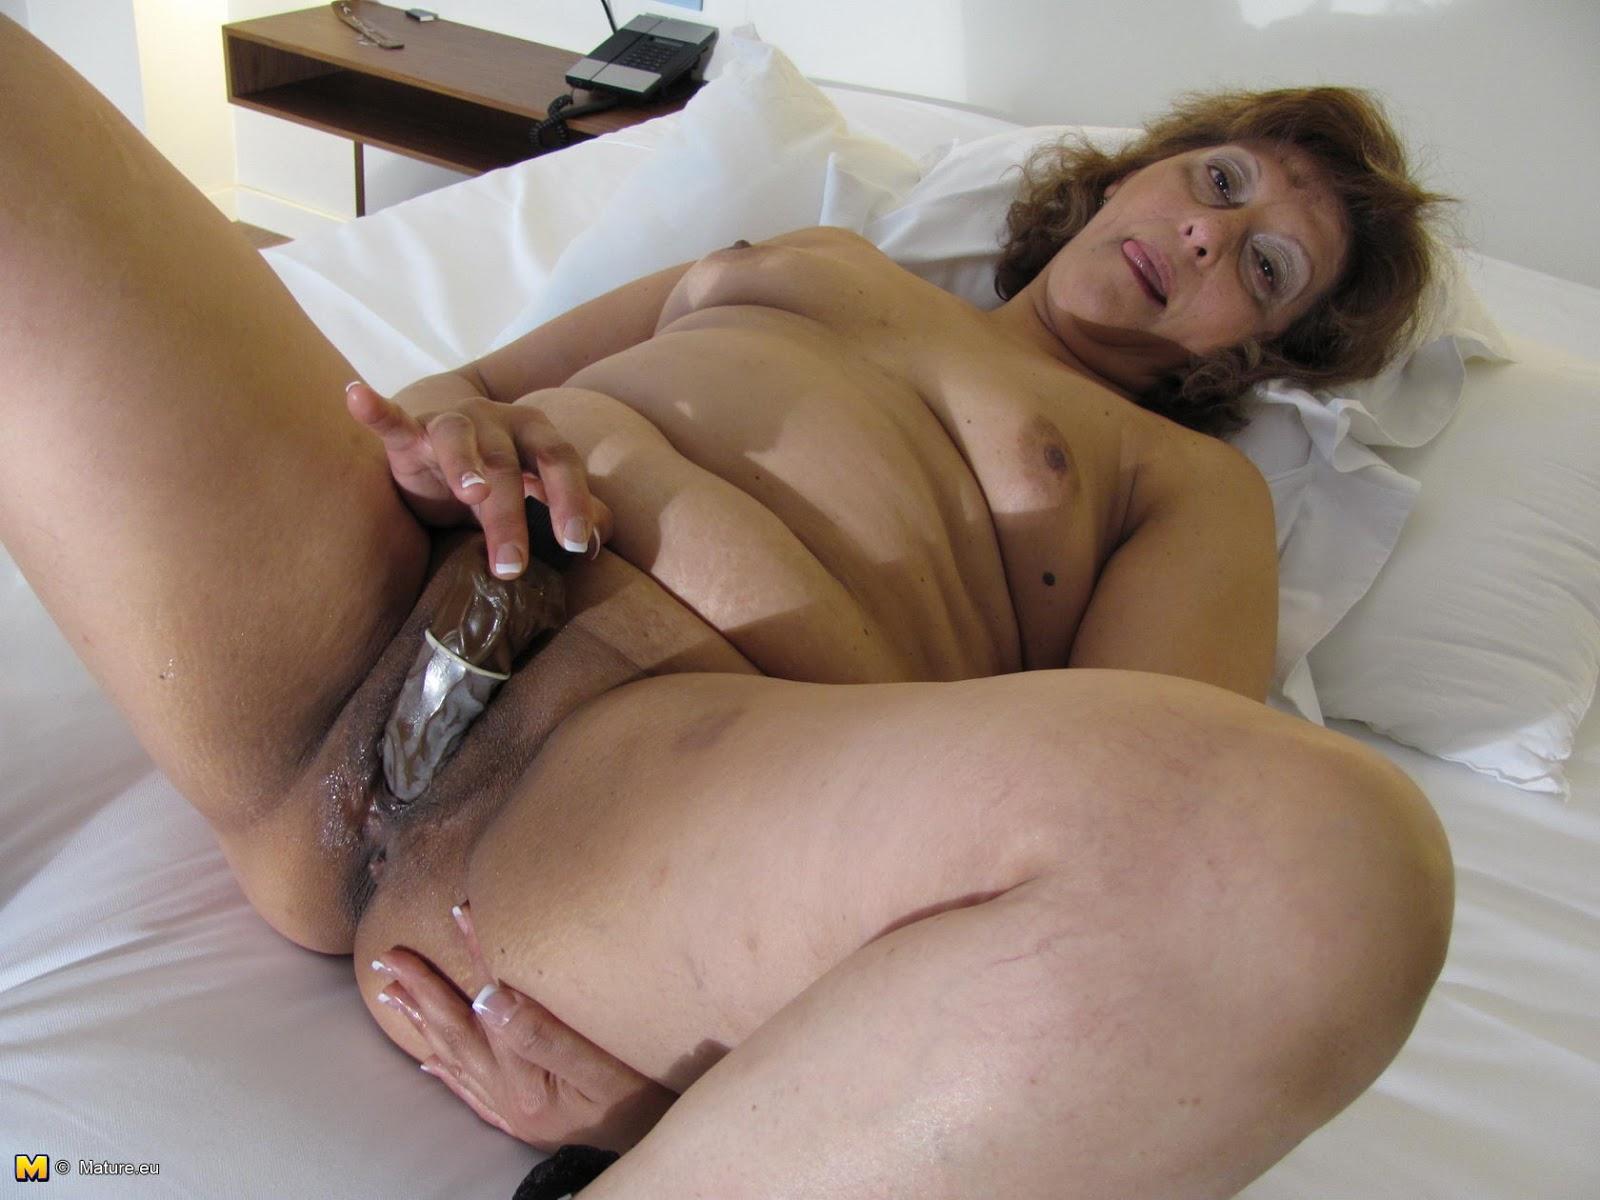 Latinagranny hot bbw matures naked photo showoff 7